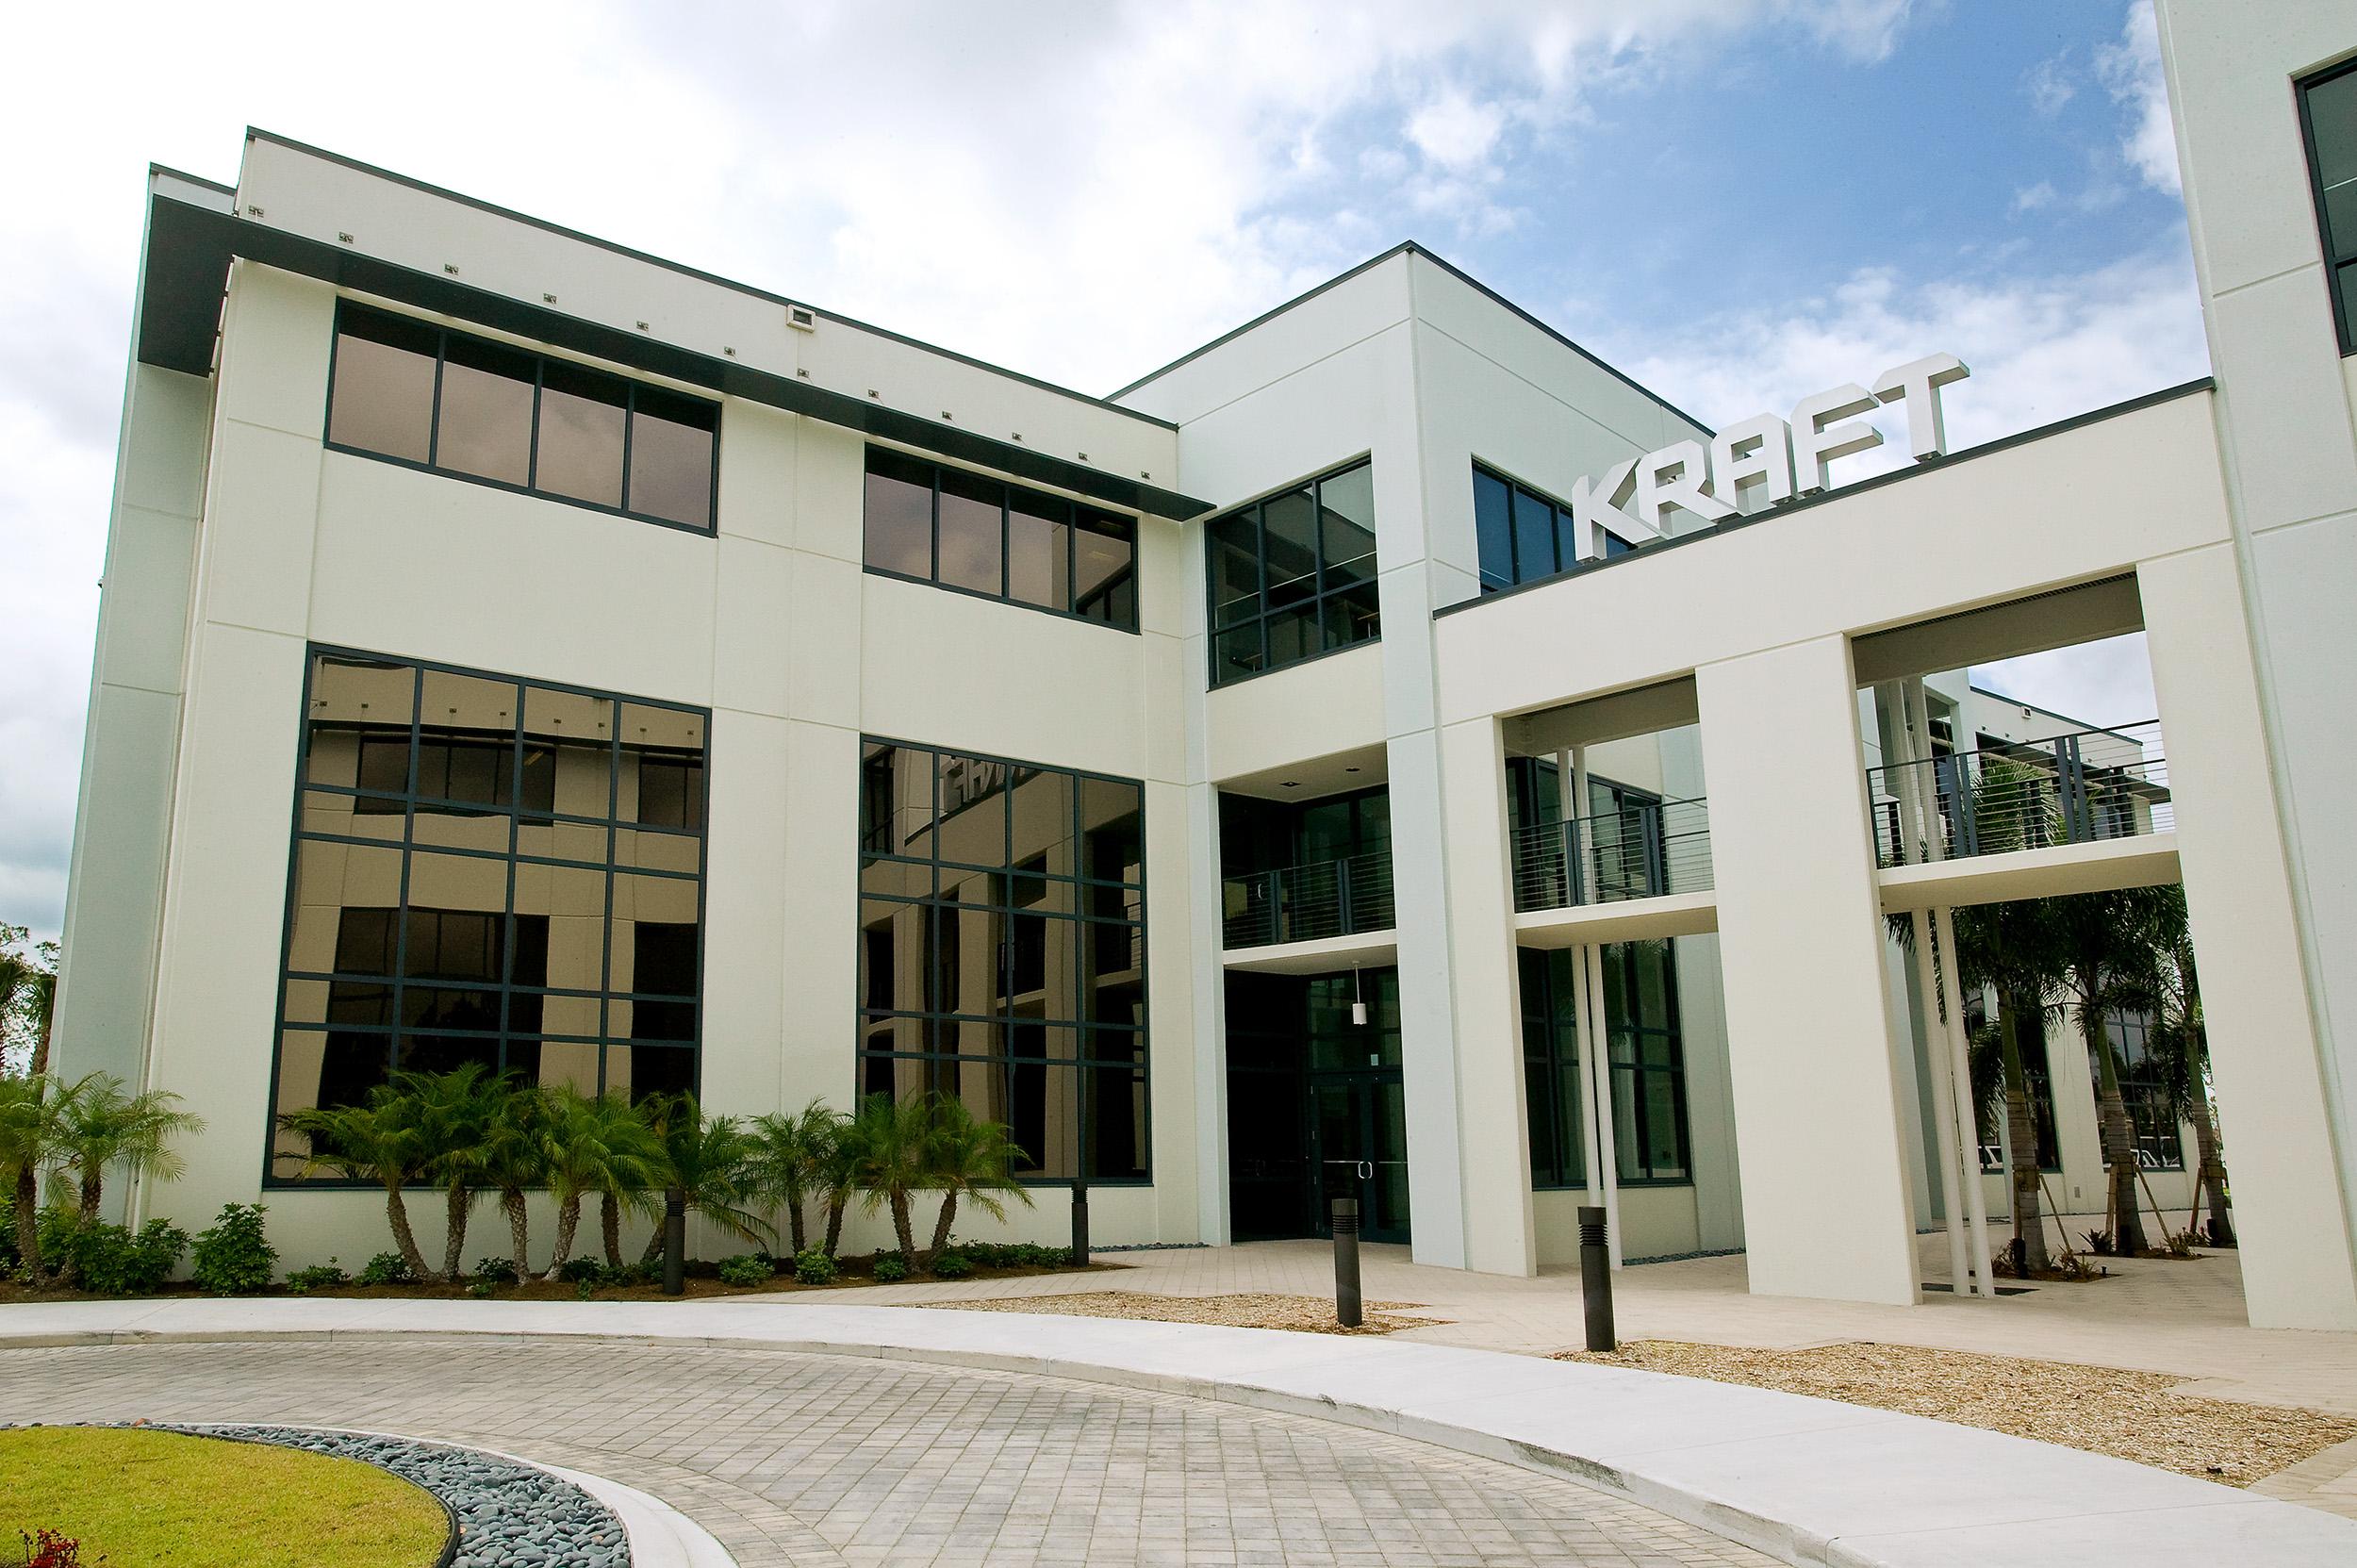 Kraft Construction Headquarters